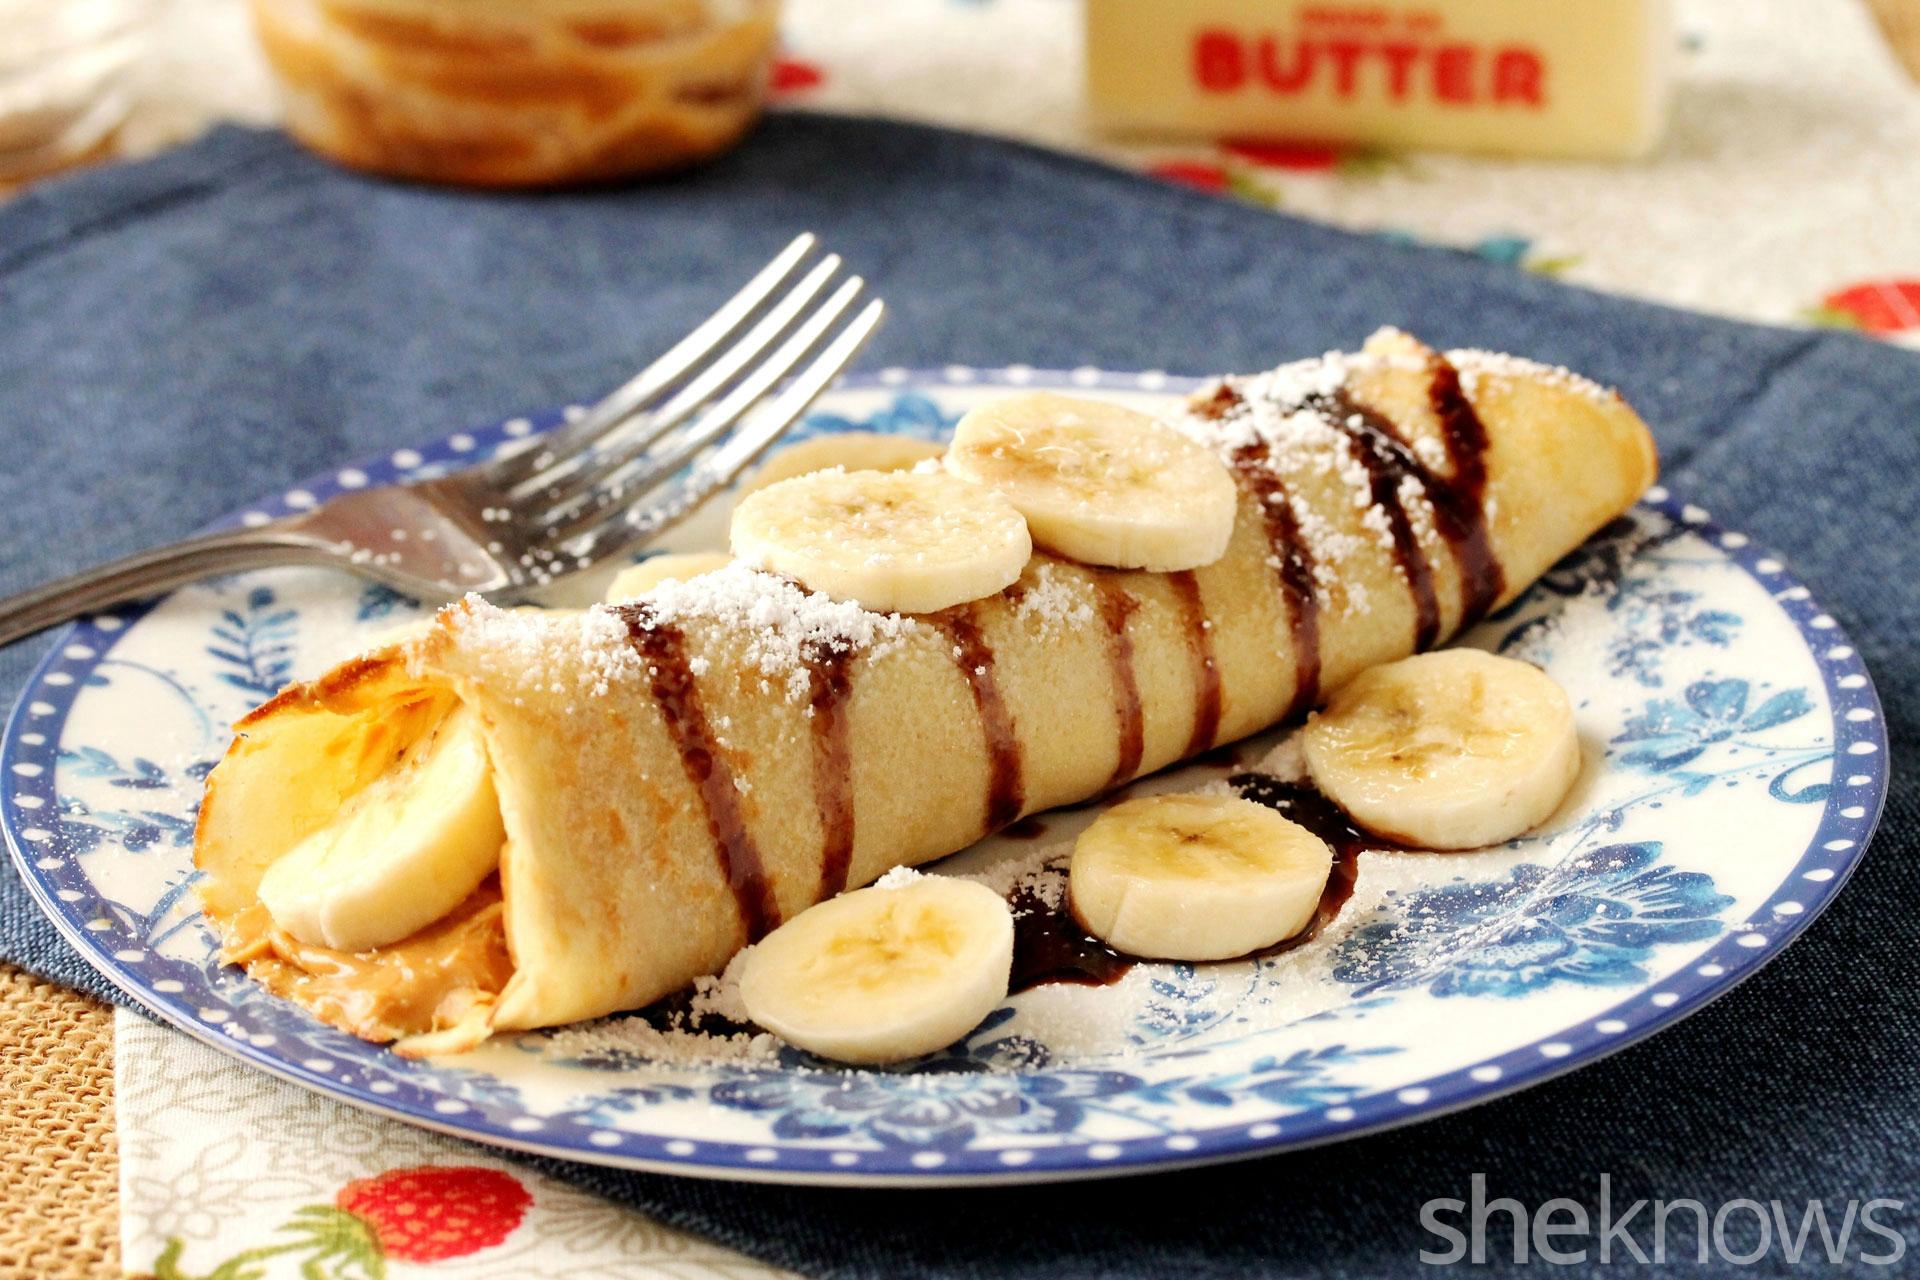 banana peanut butter crepe